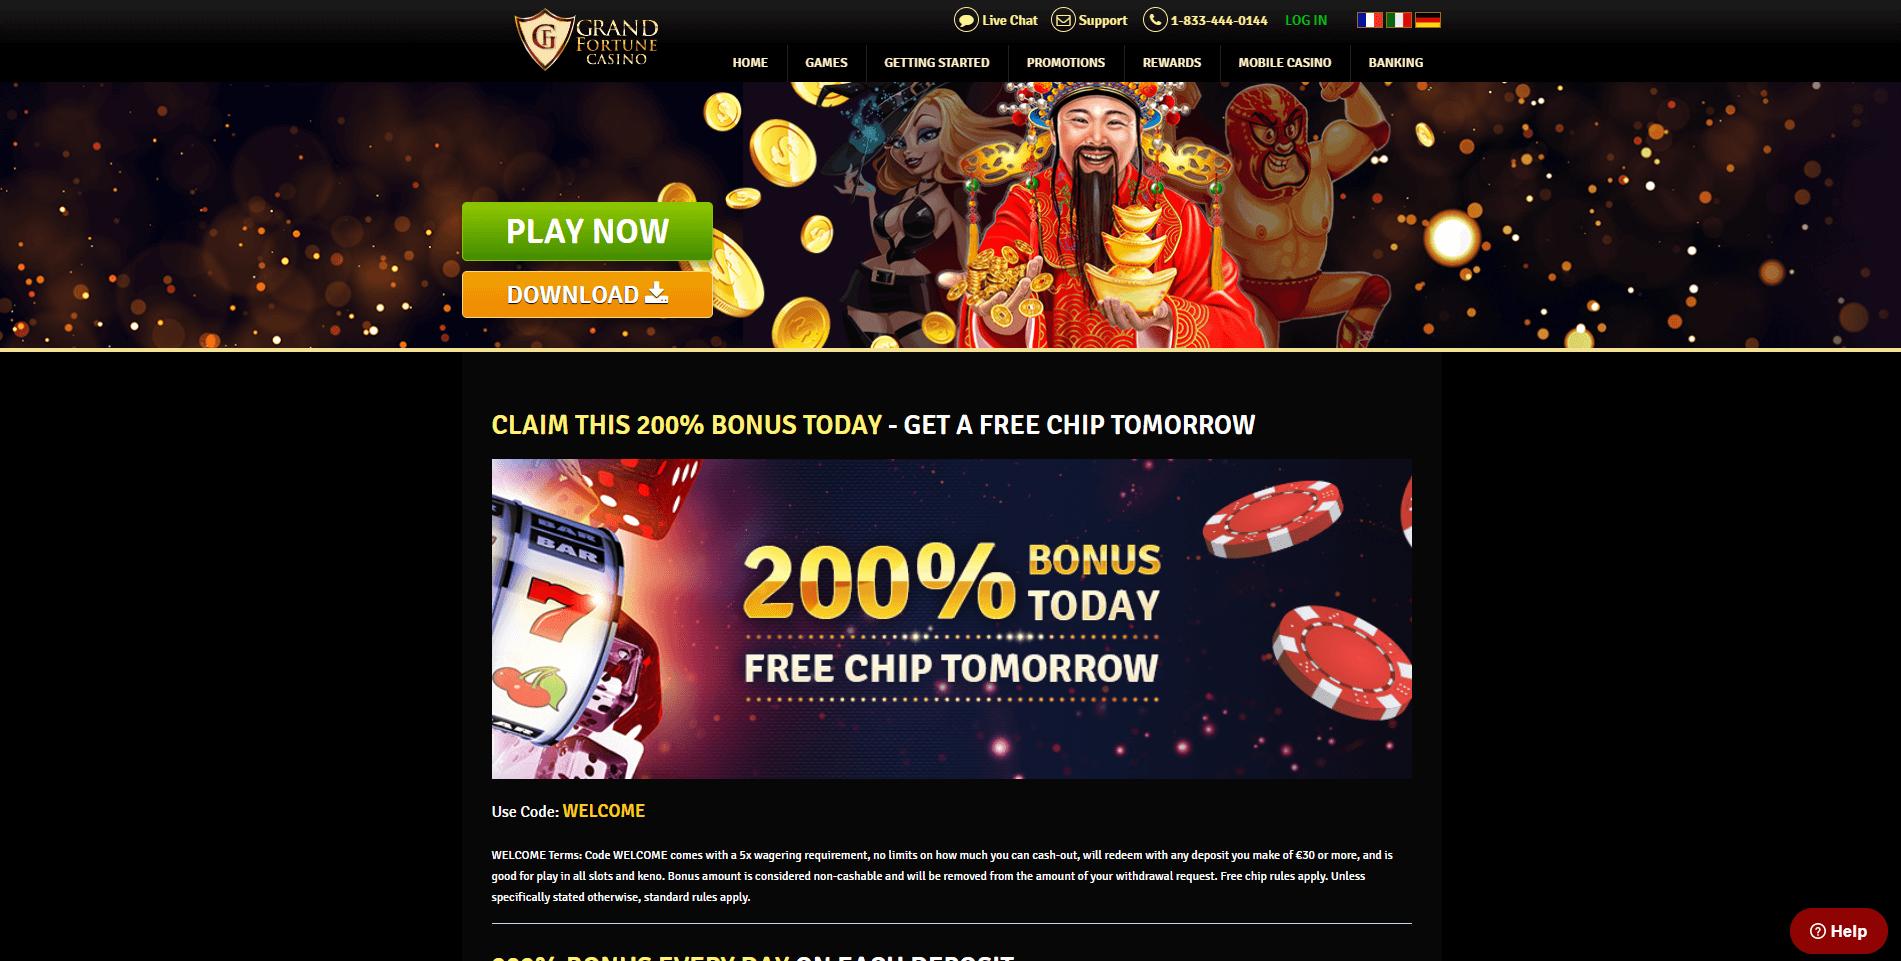 Grand Fortune Casino Coupons